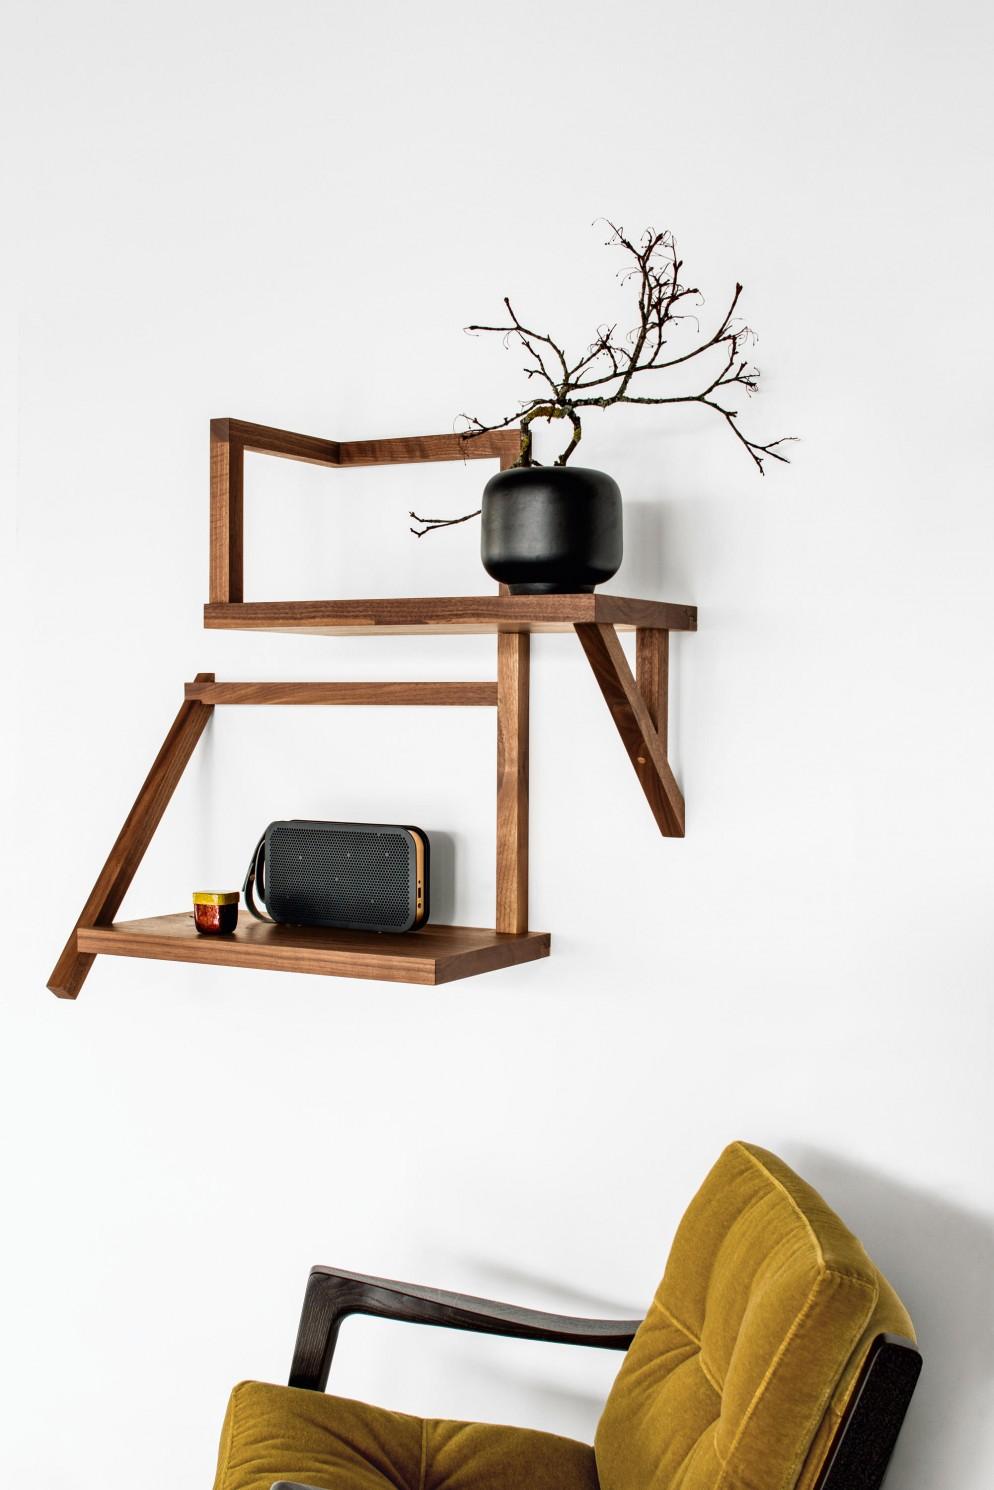 taidgh-shelf-b-a-walnut-euvira-rocking-chair-photo-hassos-h-arcit18